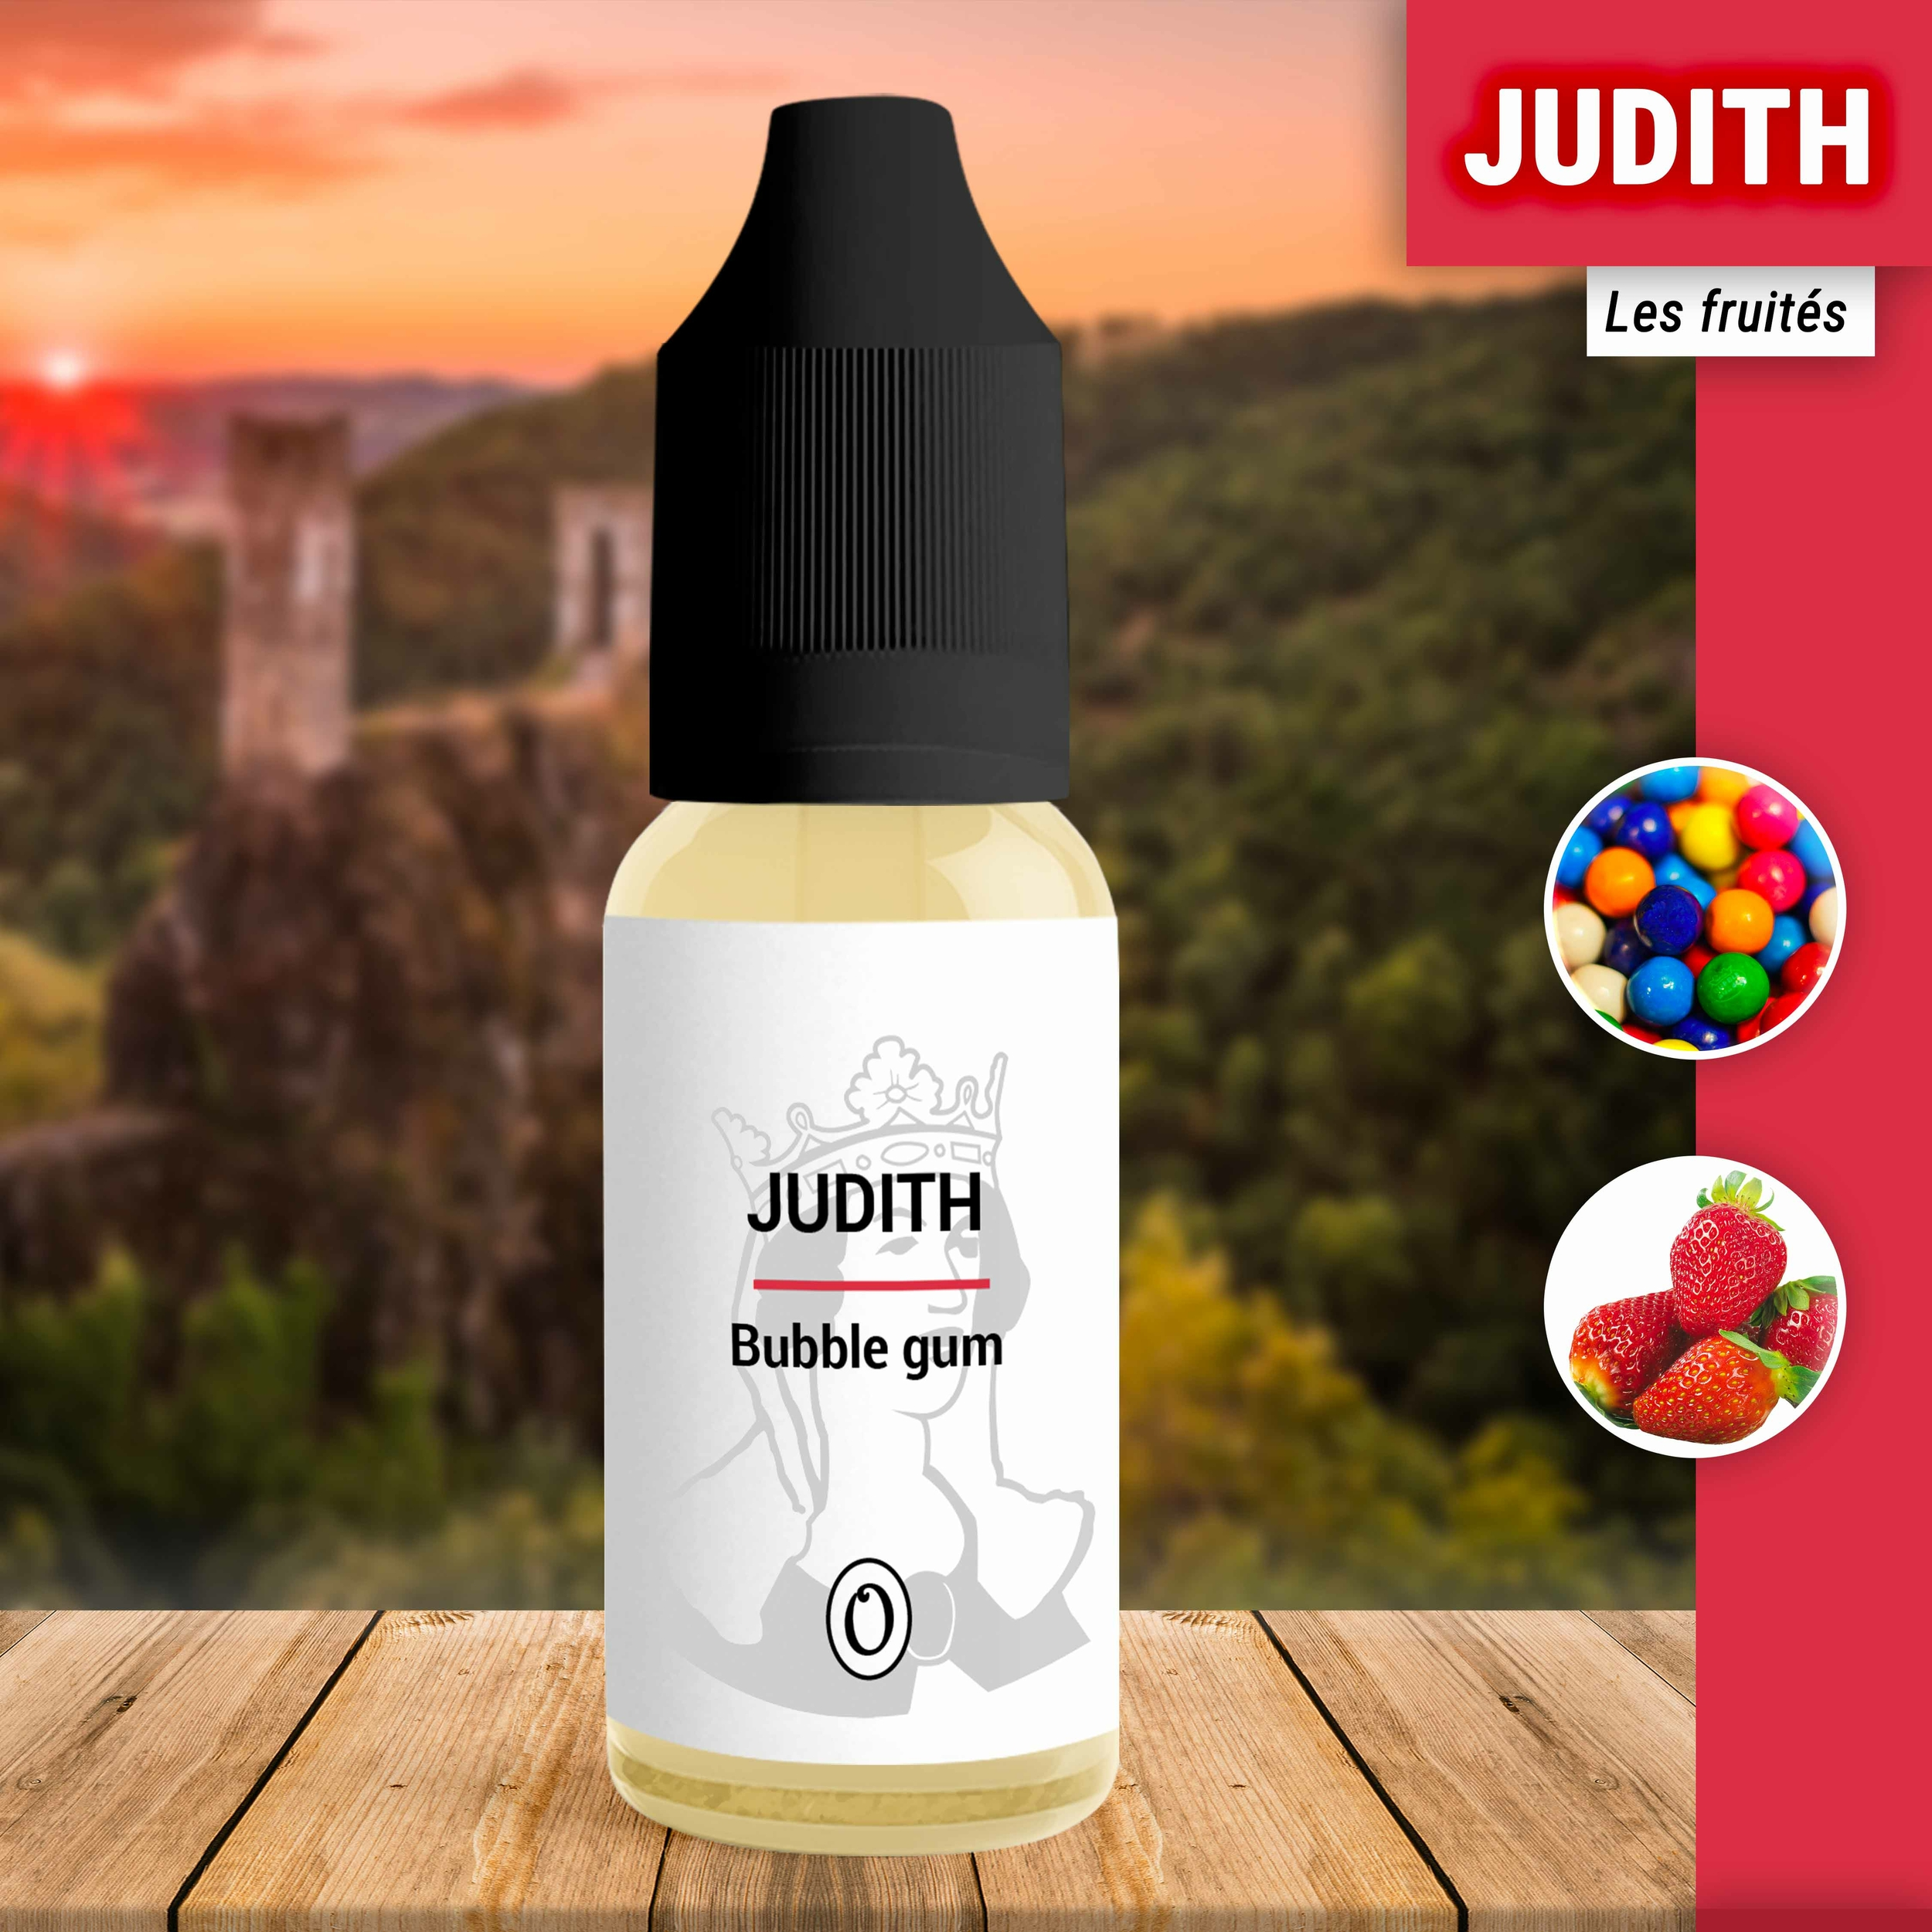 E-liquide Judith 10mL